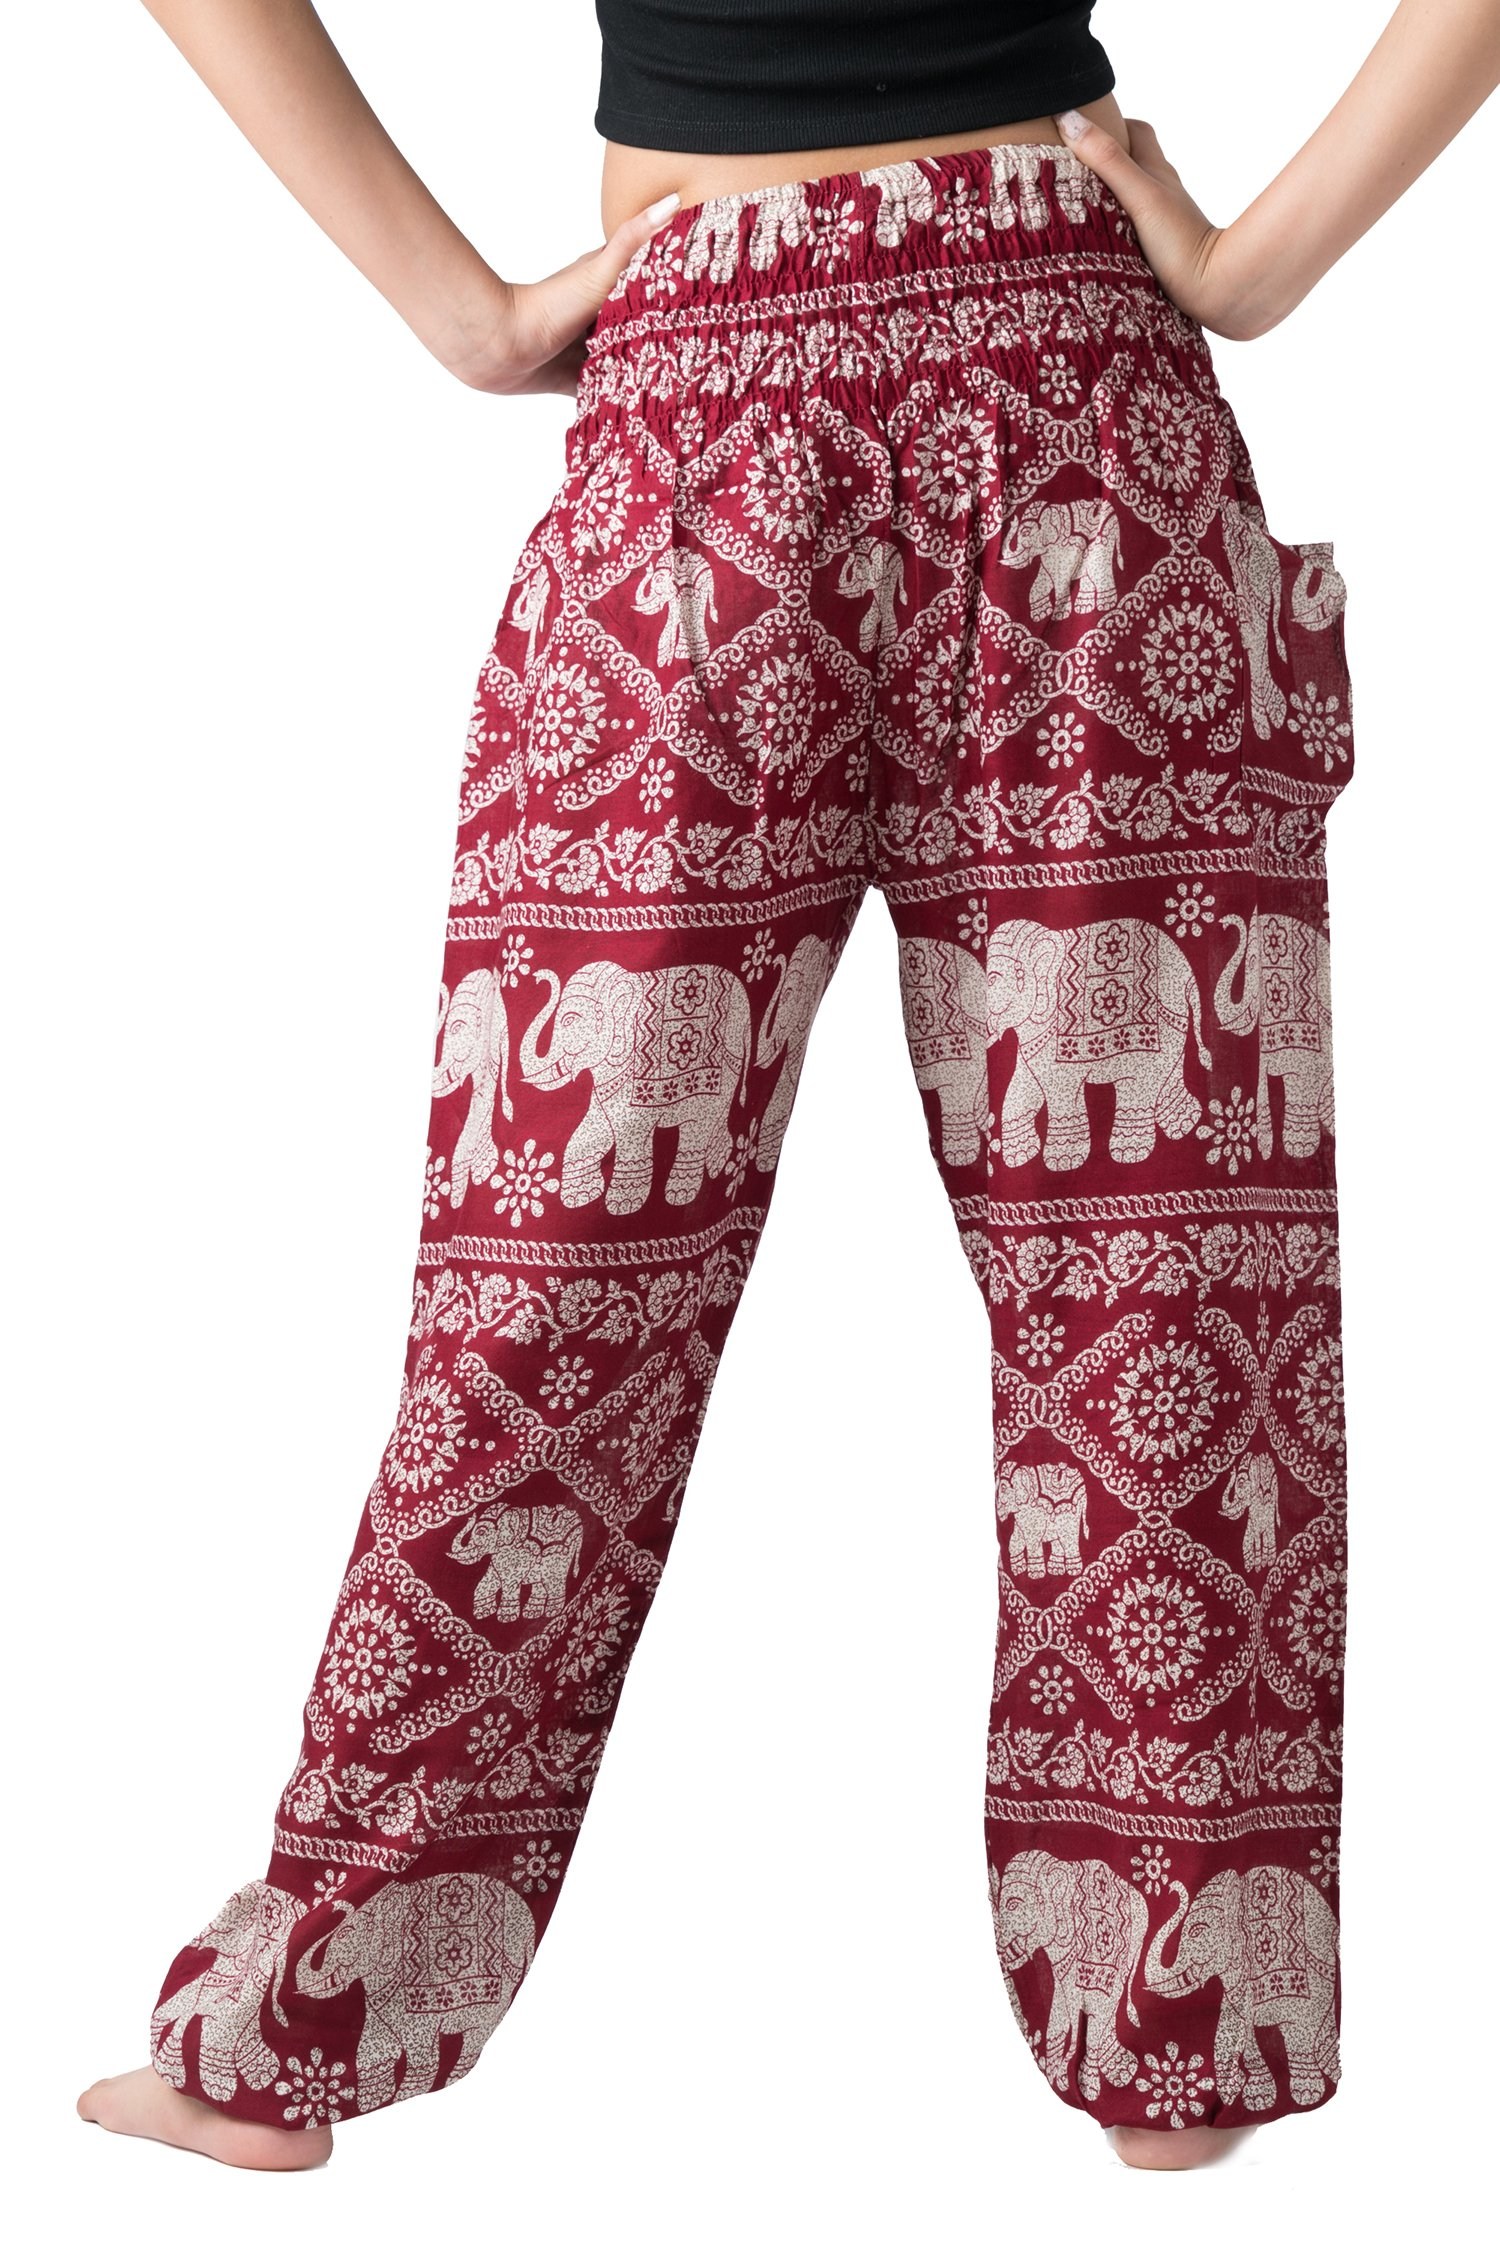 22fed0c79c8b6 Bangkokpants Women's Casual Pants Harem Bohemian Clothes Hippie Boho Yoga  Outfits Smocked Waist (Red, One Size) - BP2015 < Pants < Sports & Outdoors  - tibs